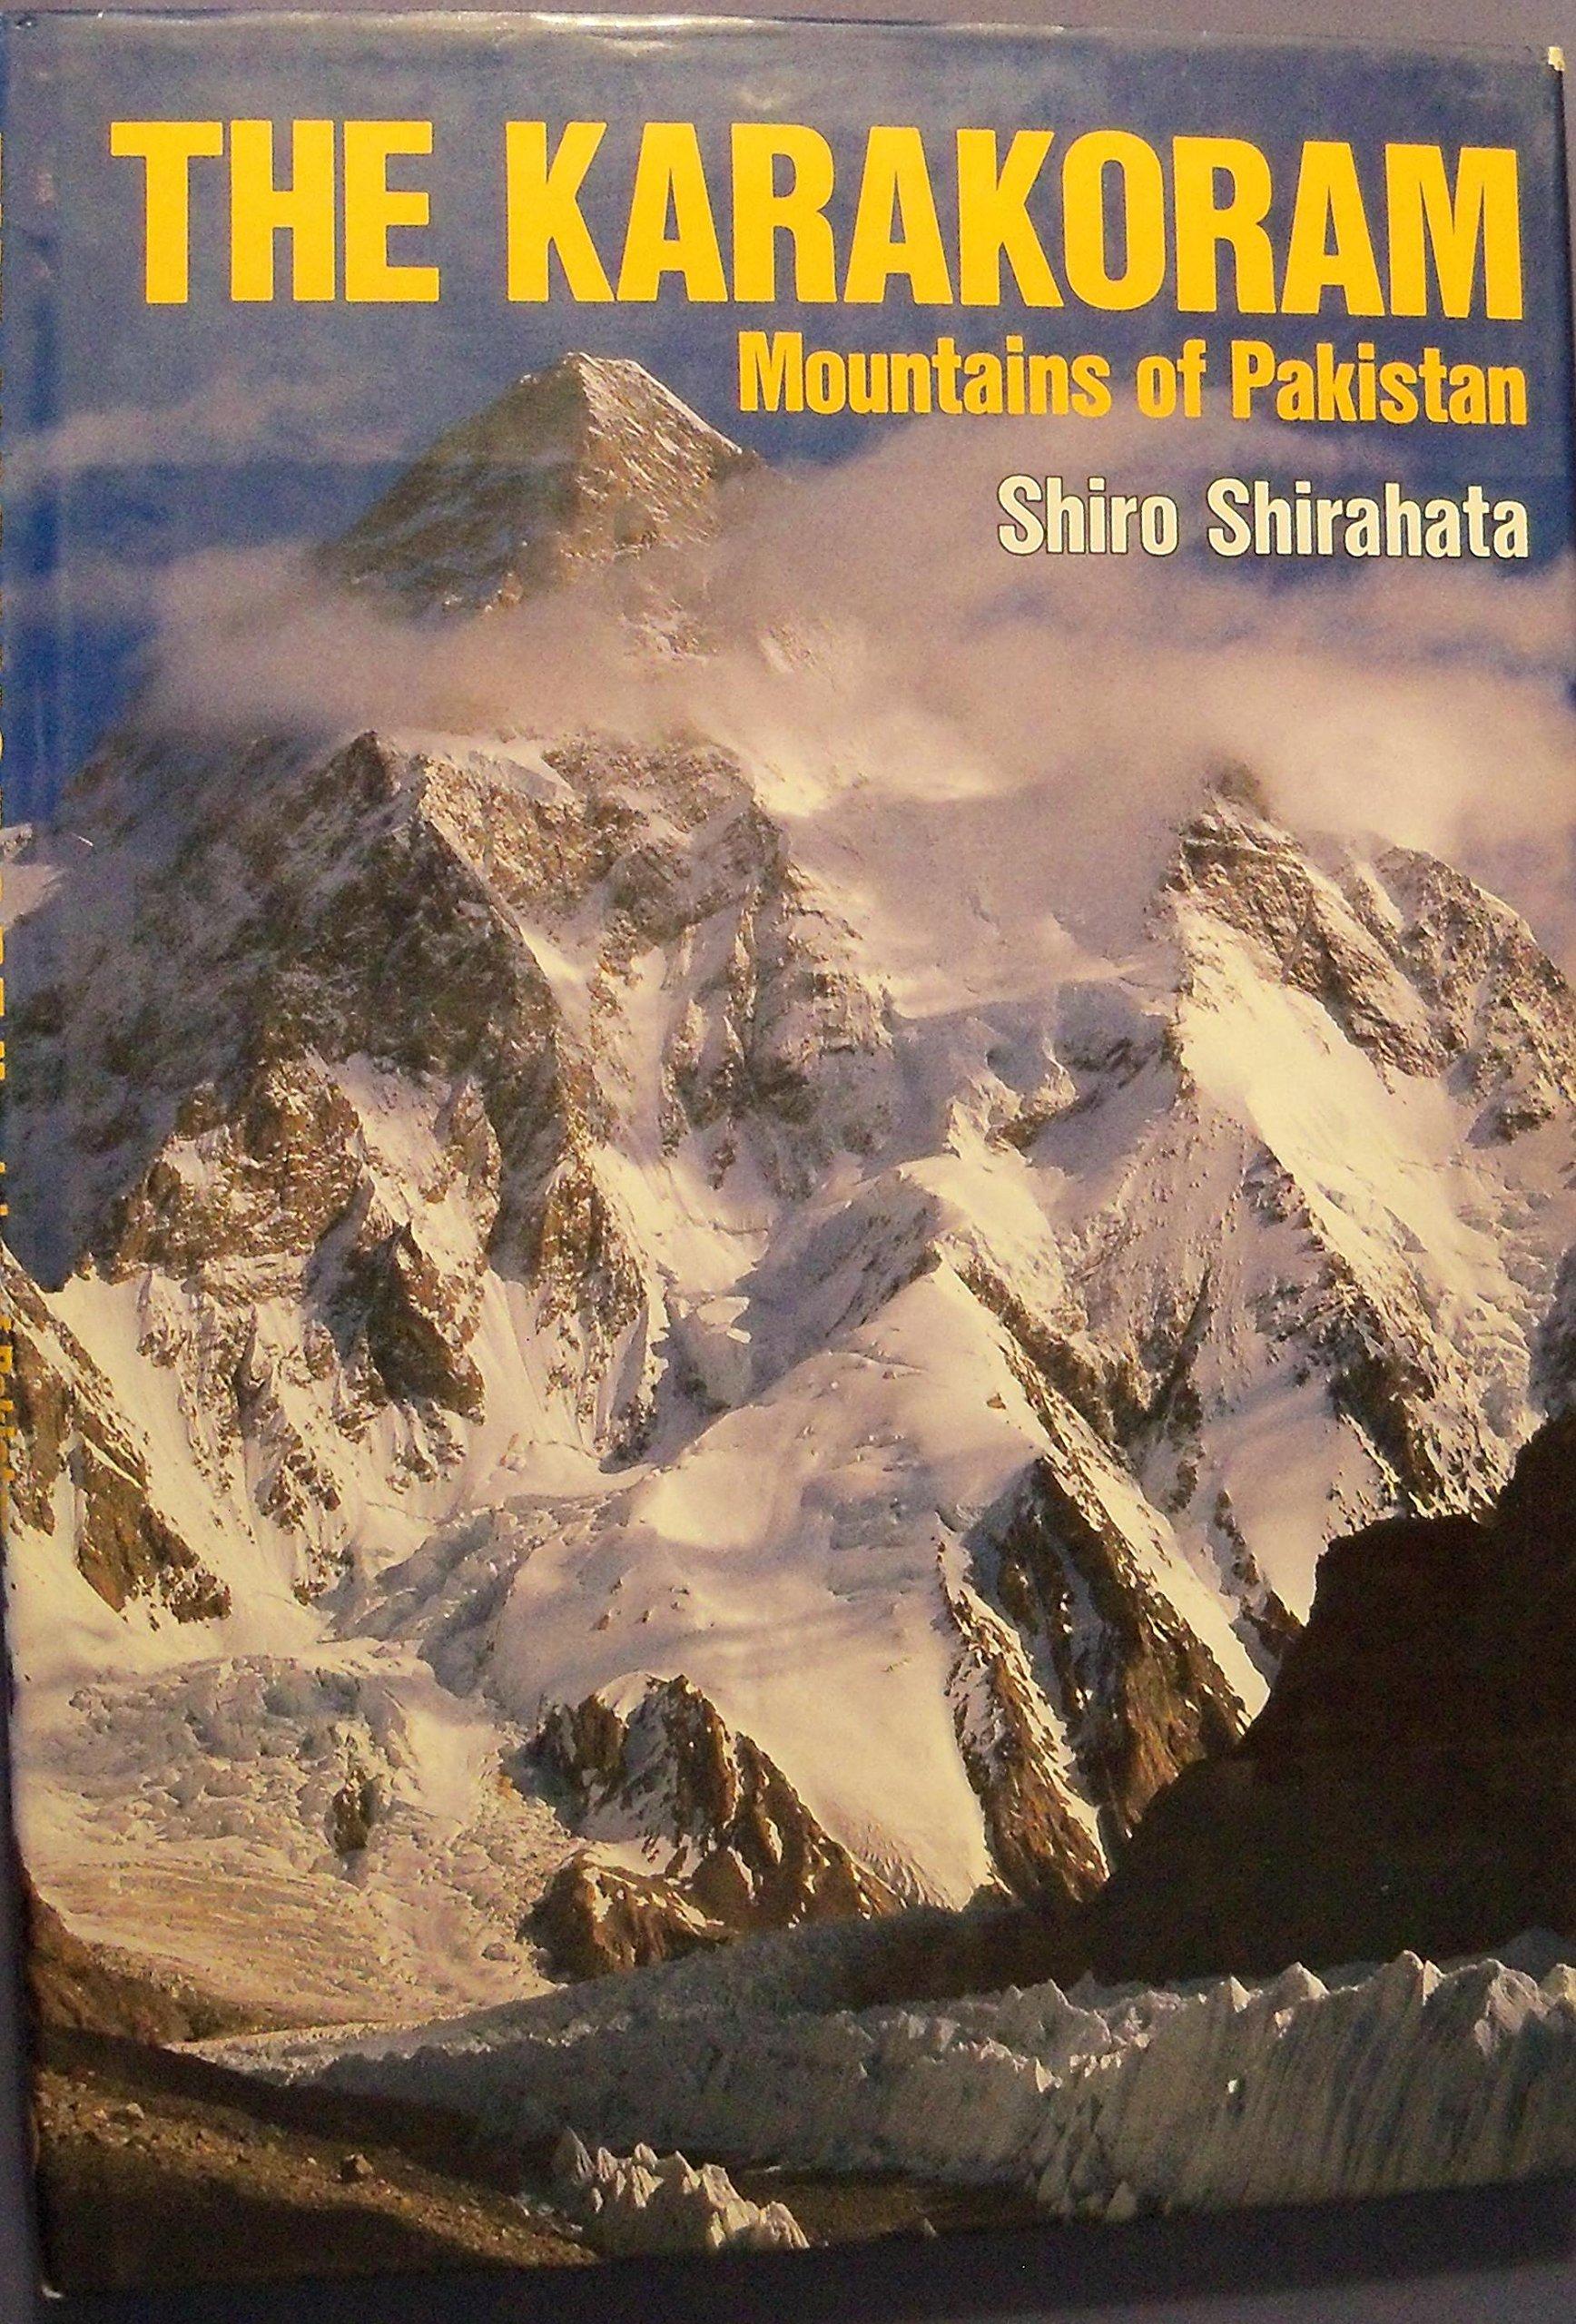 The Karakoram Mountains of Pakistan